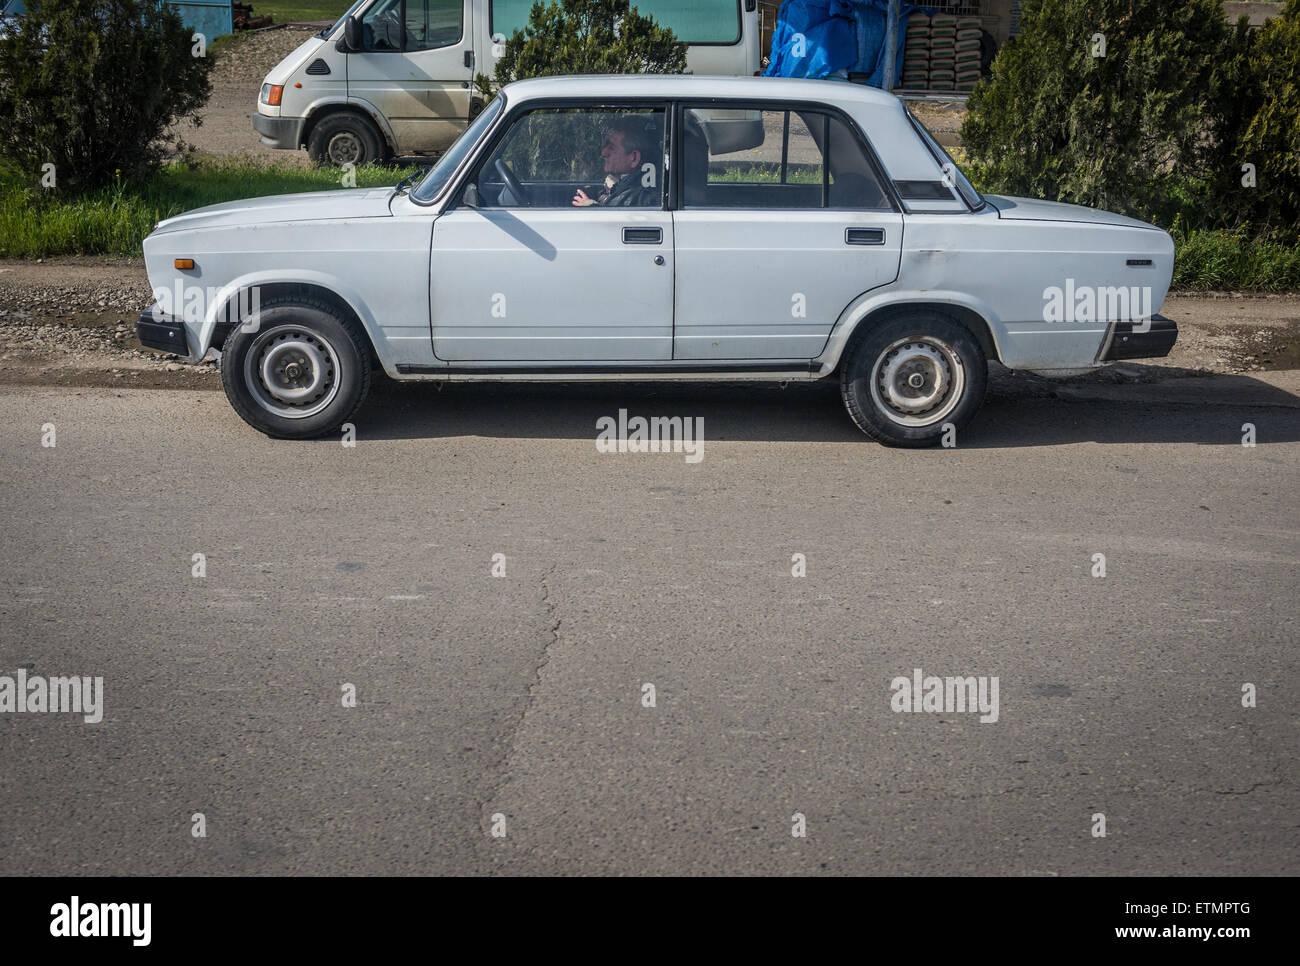 Lada 1600 car (VAZ 2106) in Tbilisi, capital of Georgia